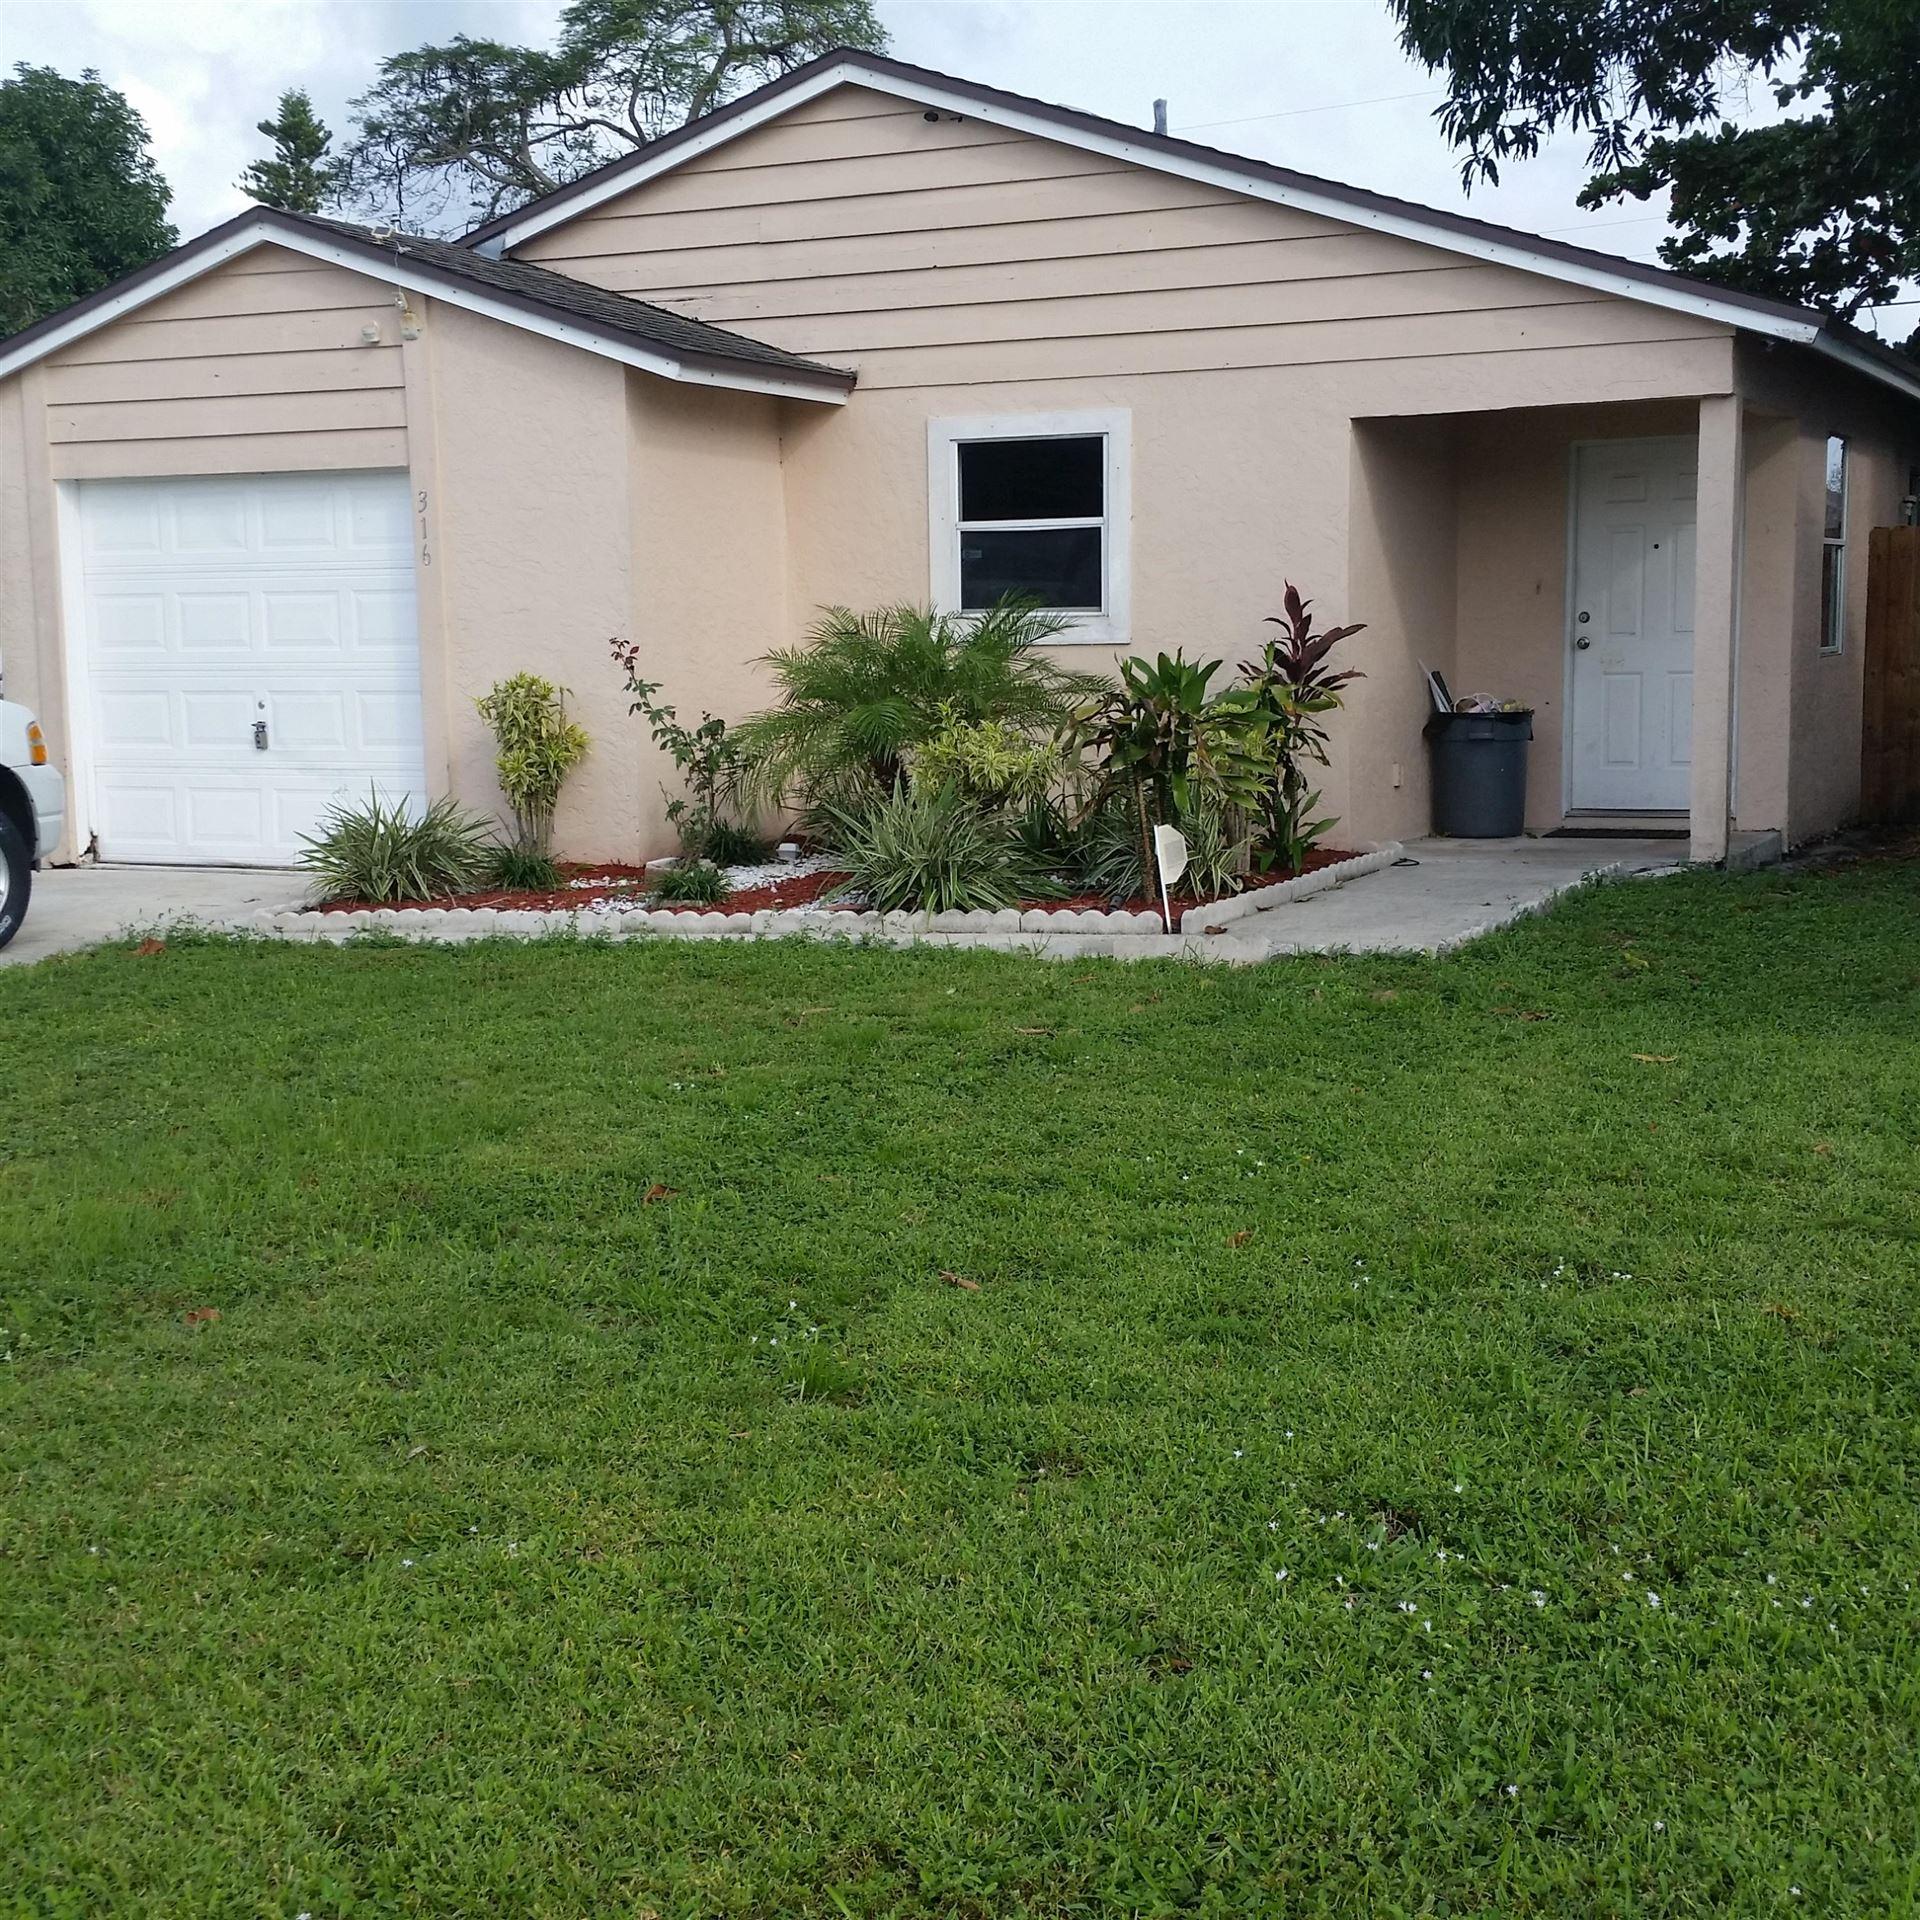 316 Fleming Avenue, Greenacres, FL 33463 - MLS#: RX-10726496